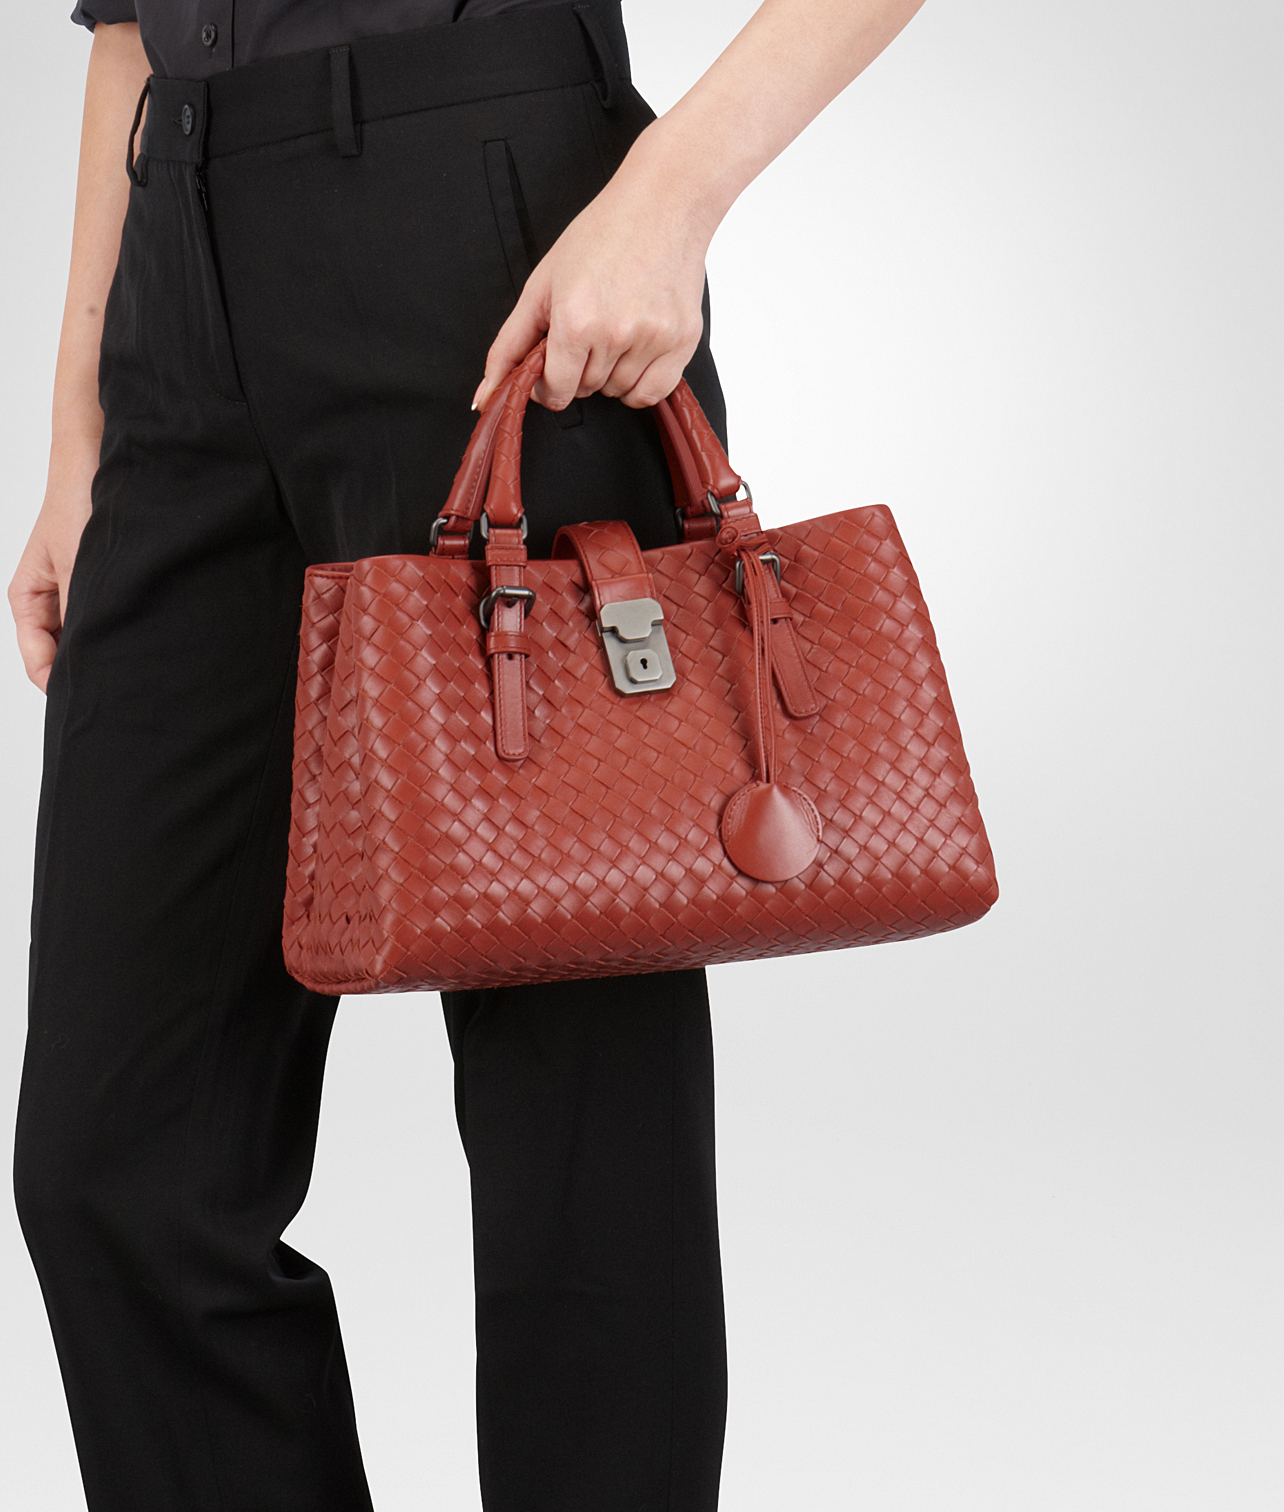 a8e4f189fef1 Lyst - Bottega Veneta Burnt Red Intrecciato Light Calf Roma Bag in Red